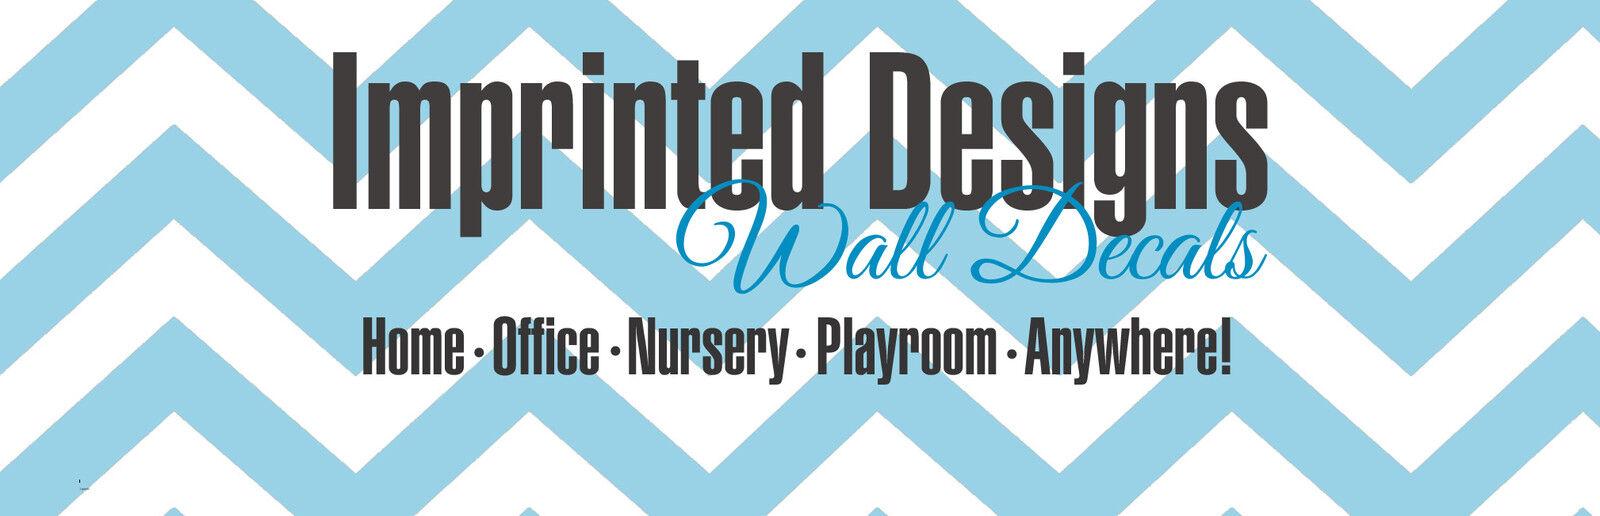 Imprinted Designs